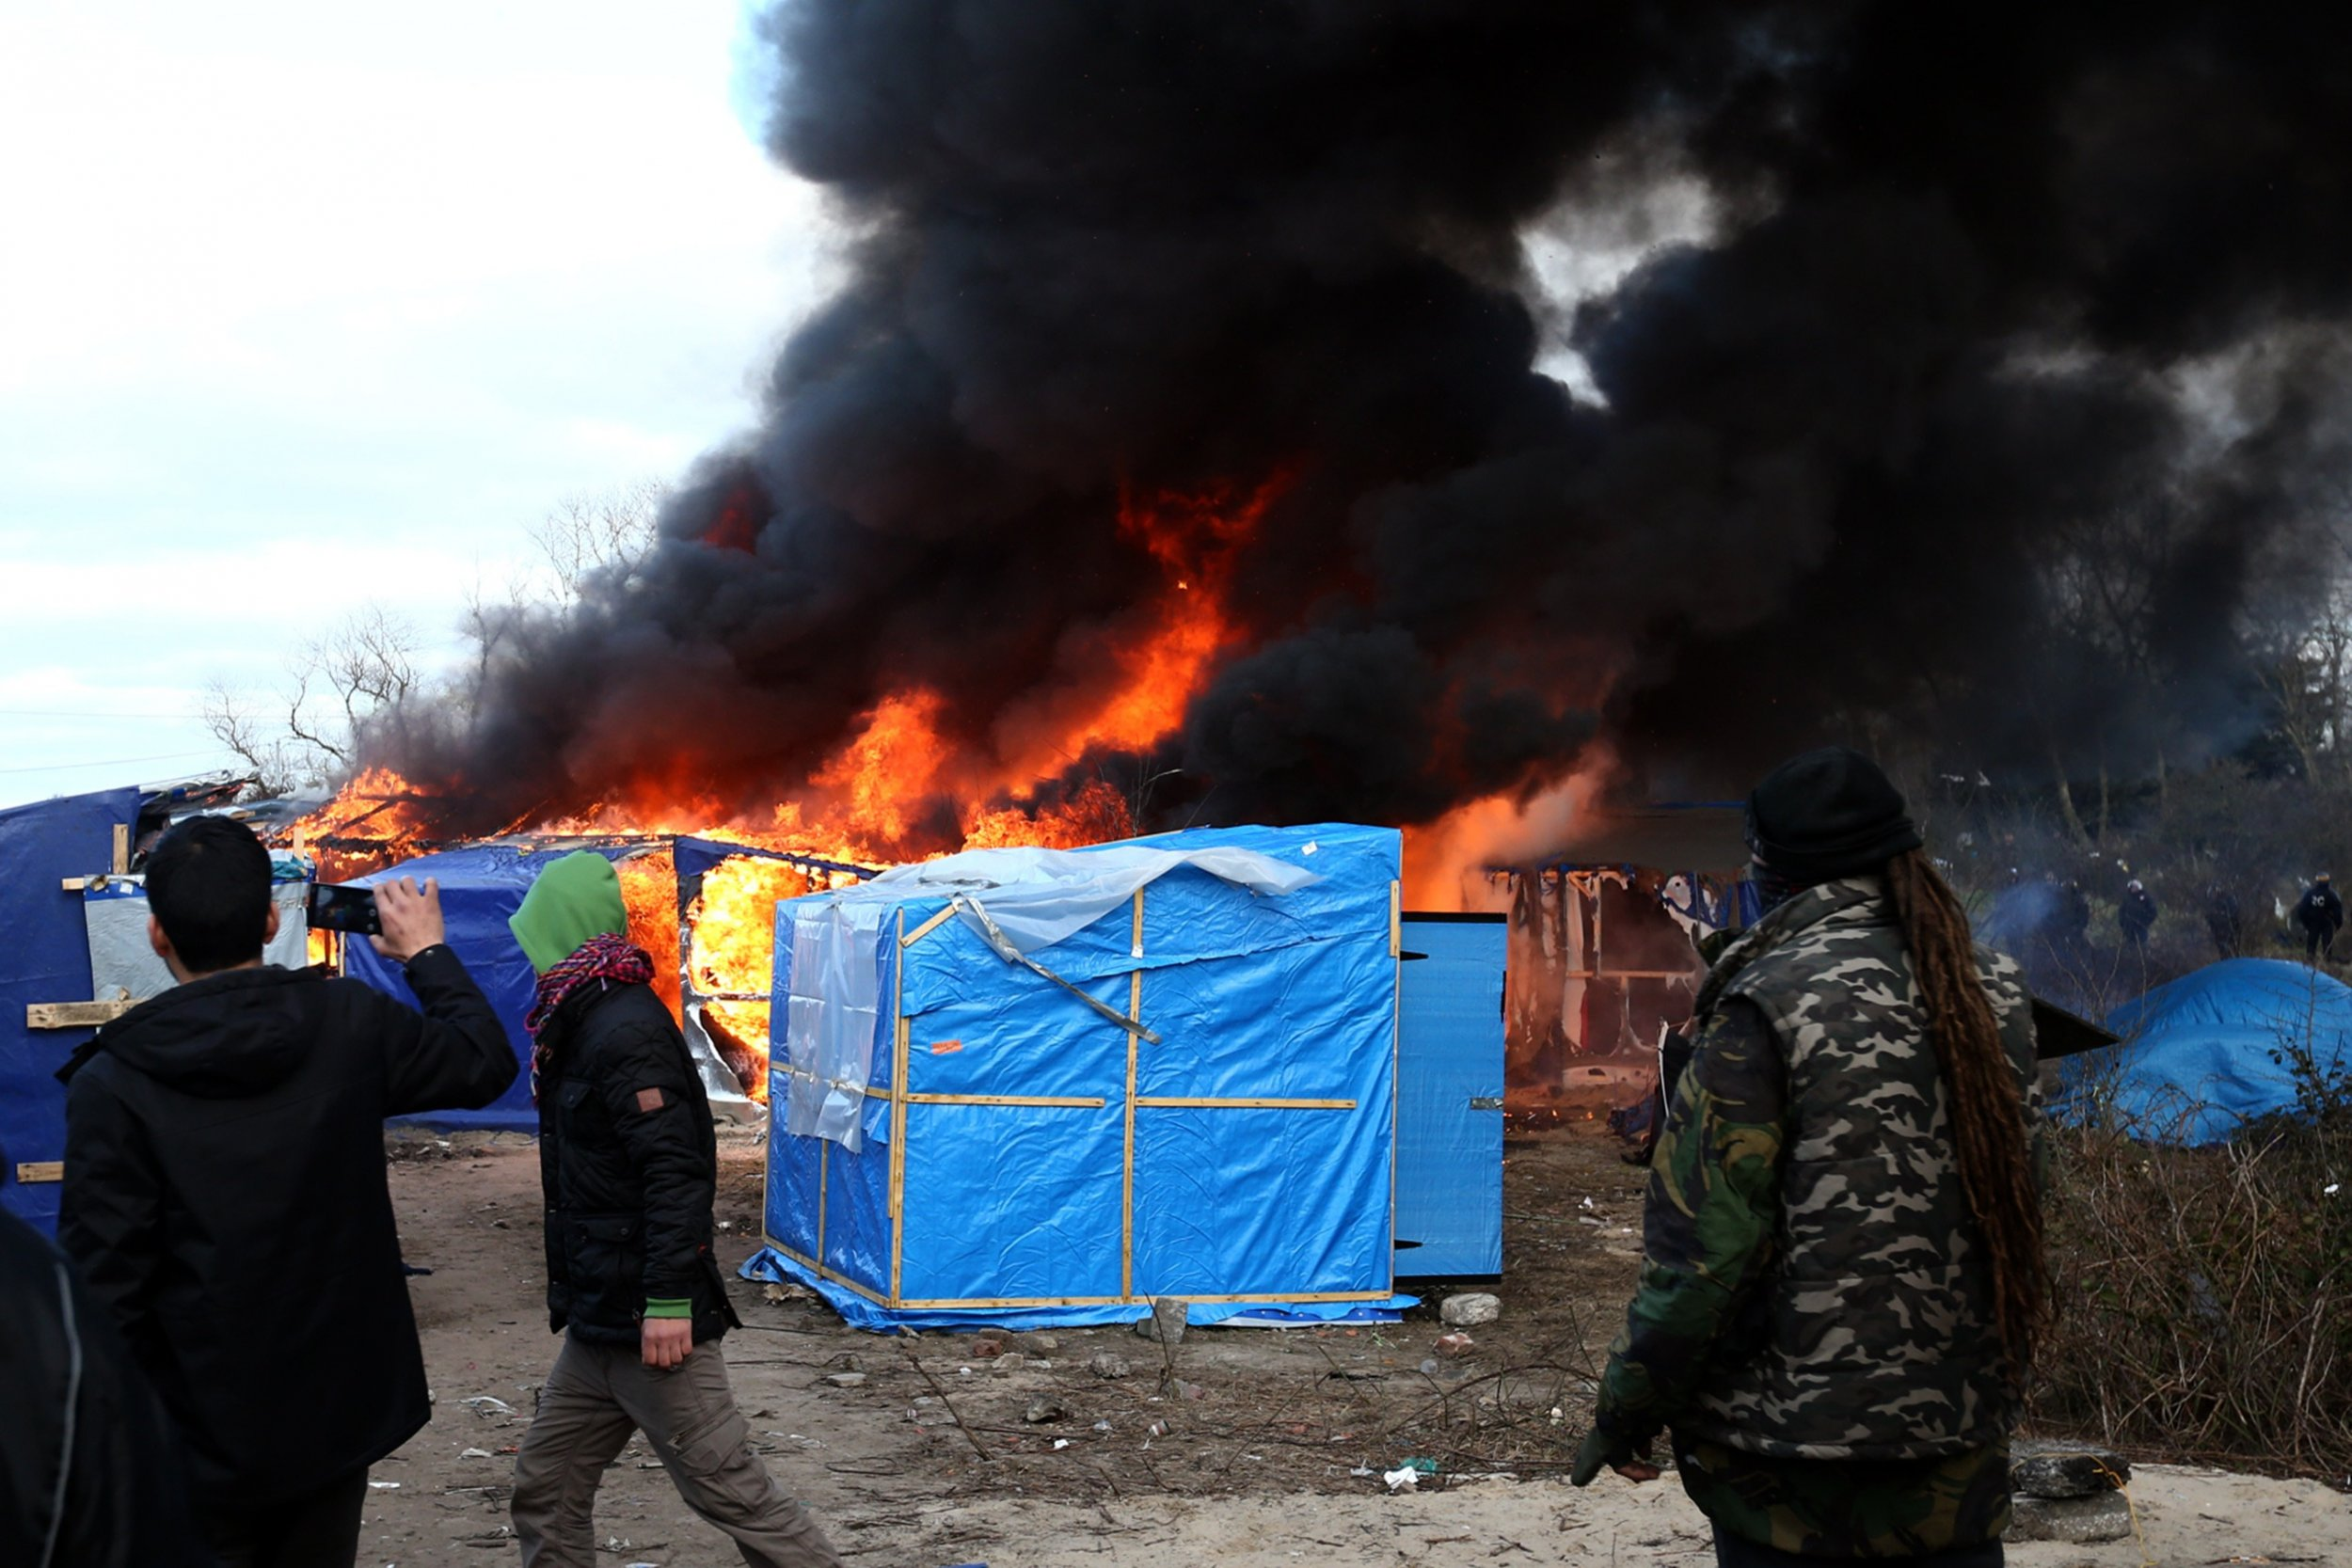 A hut burns in the Calais Jungle.